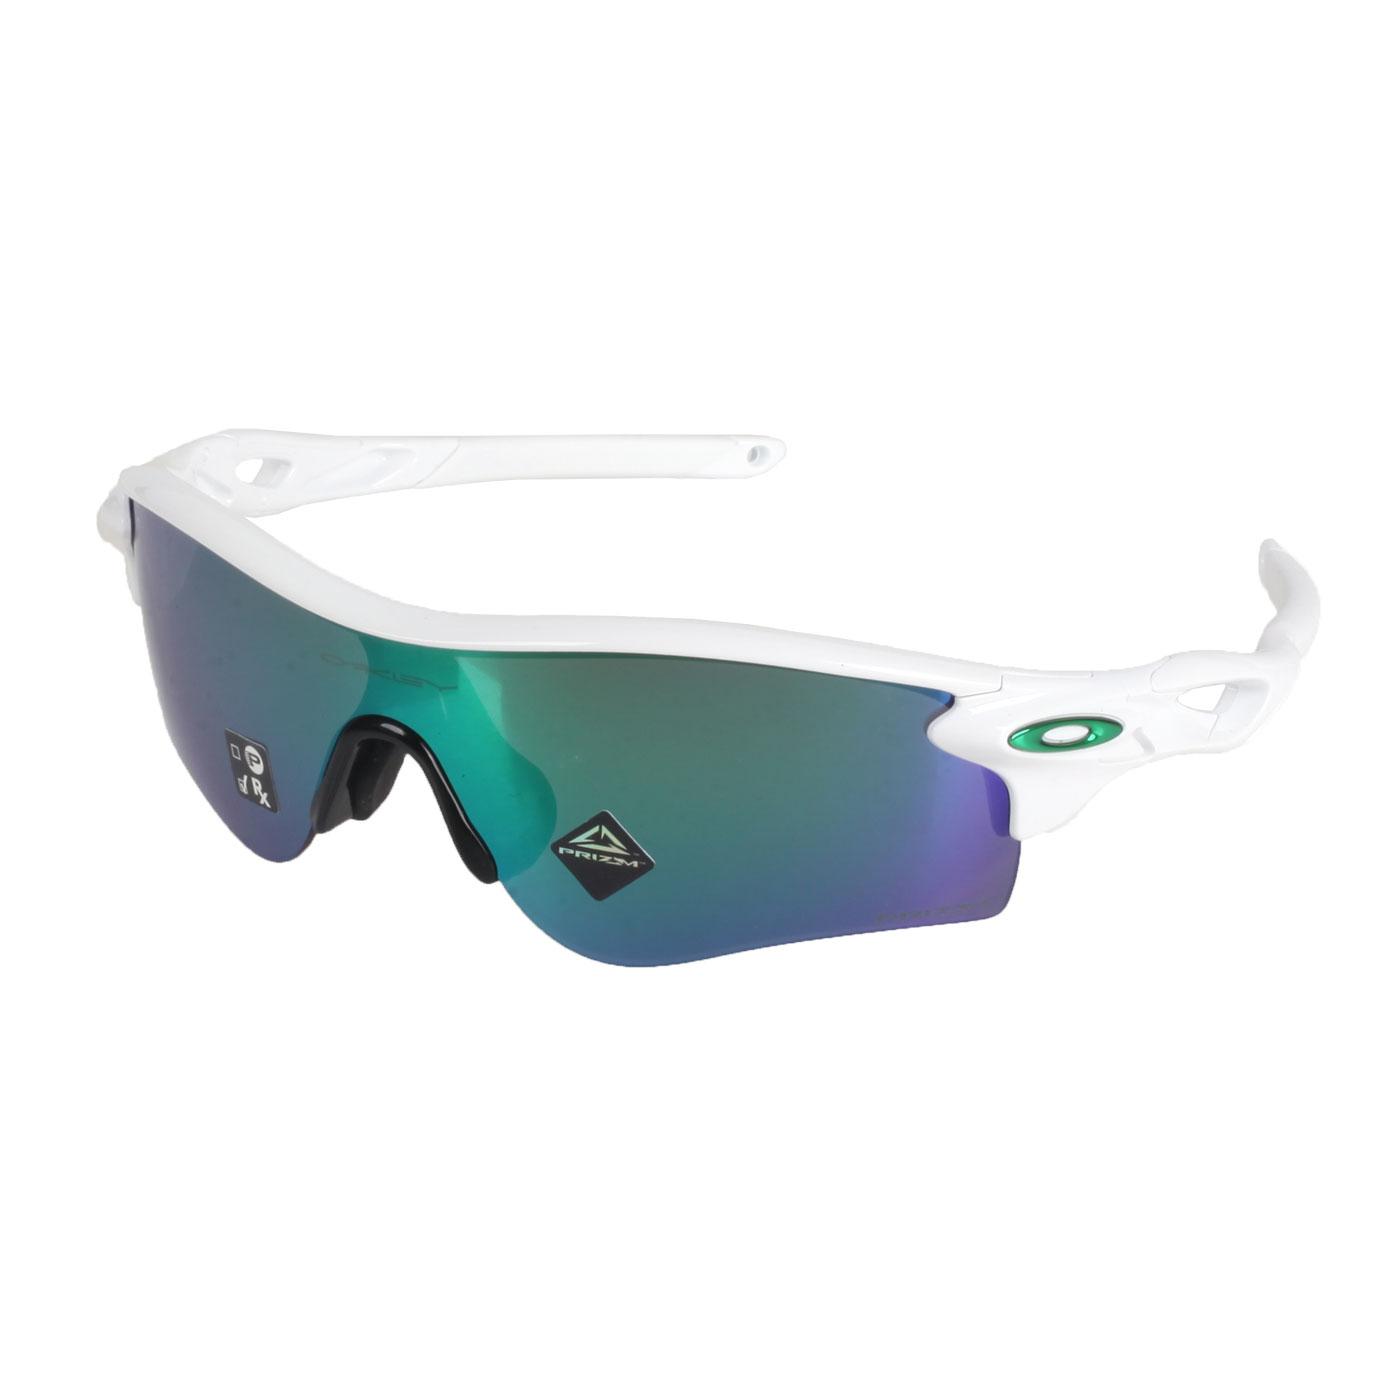 OAKLEY RADARLOCK PATH 一般太陽眼鏡(附硬盒鼻墊) OAK-OO9206-4338